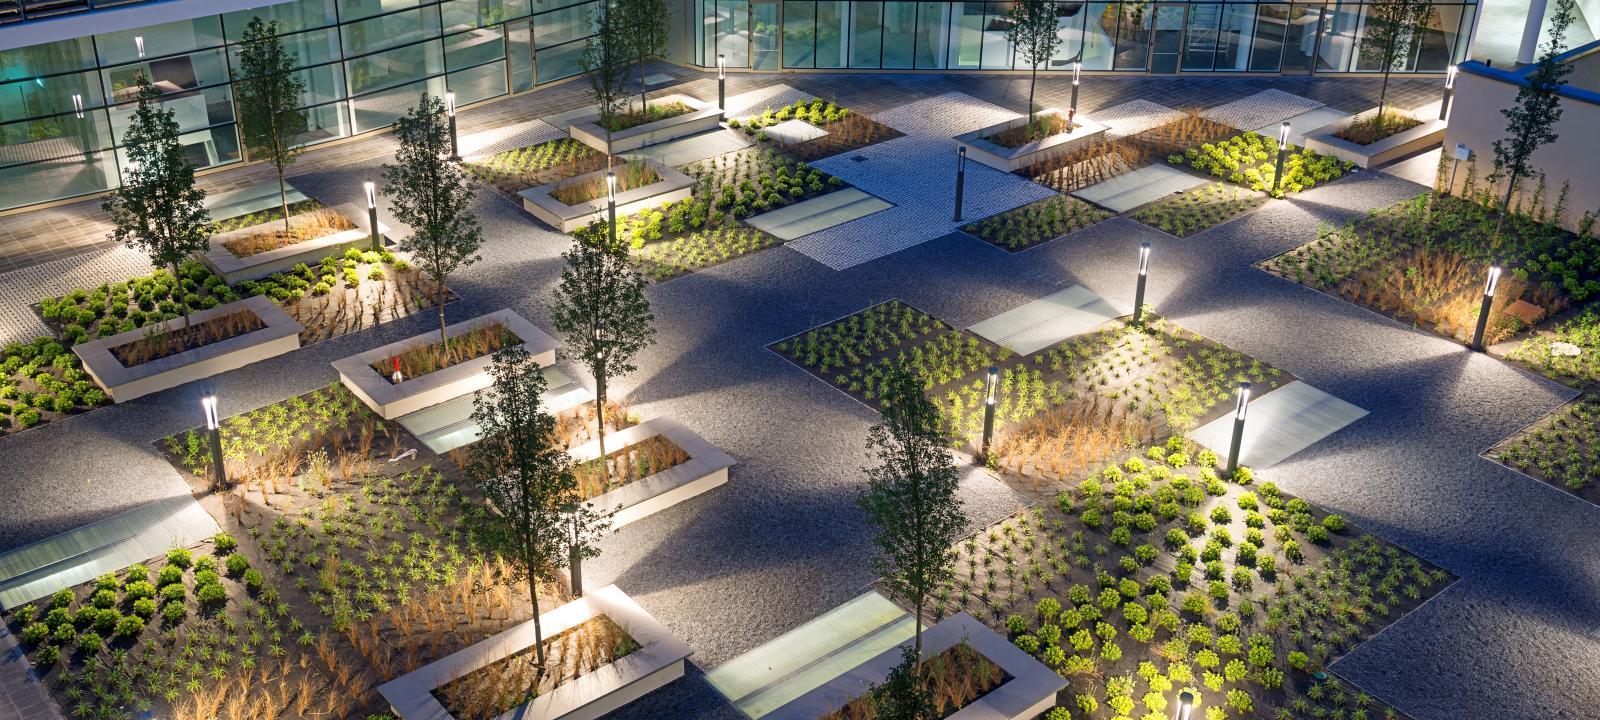 Walkways on Rooftops   ZinCo Arabia   Green Roof Systems